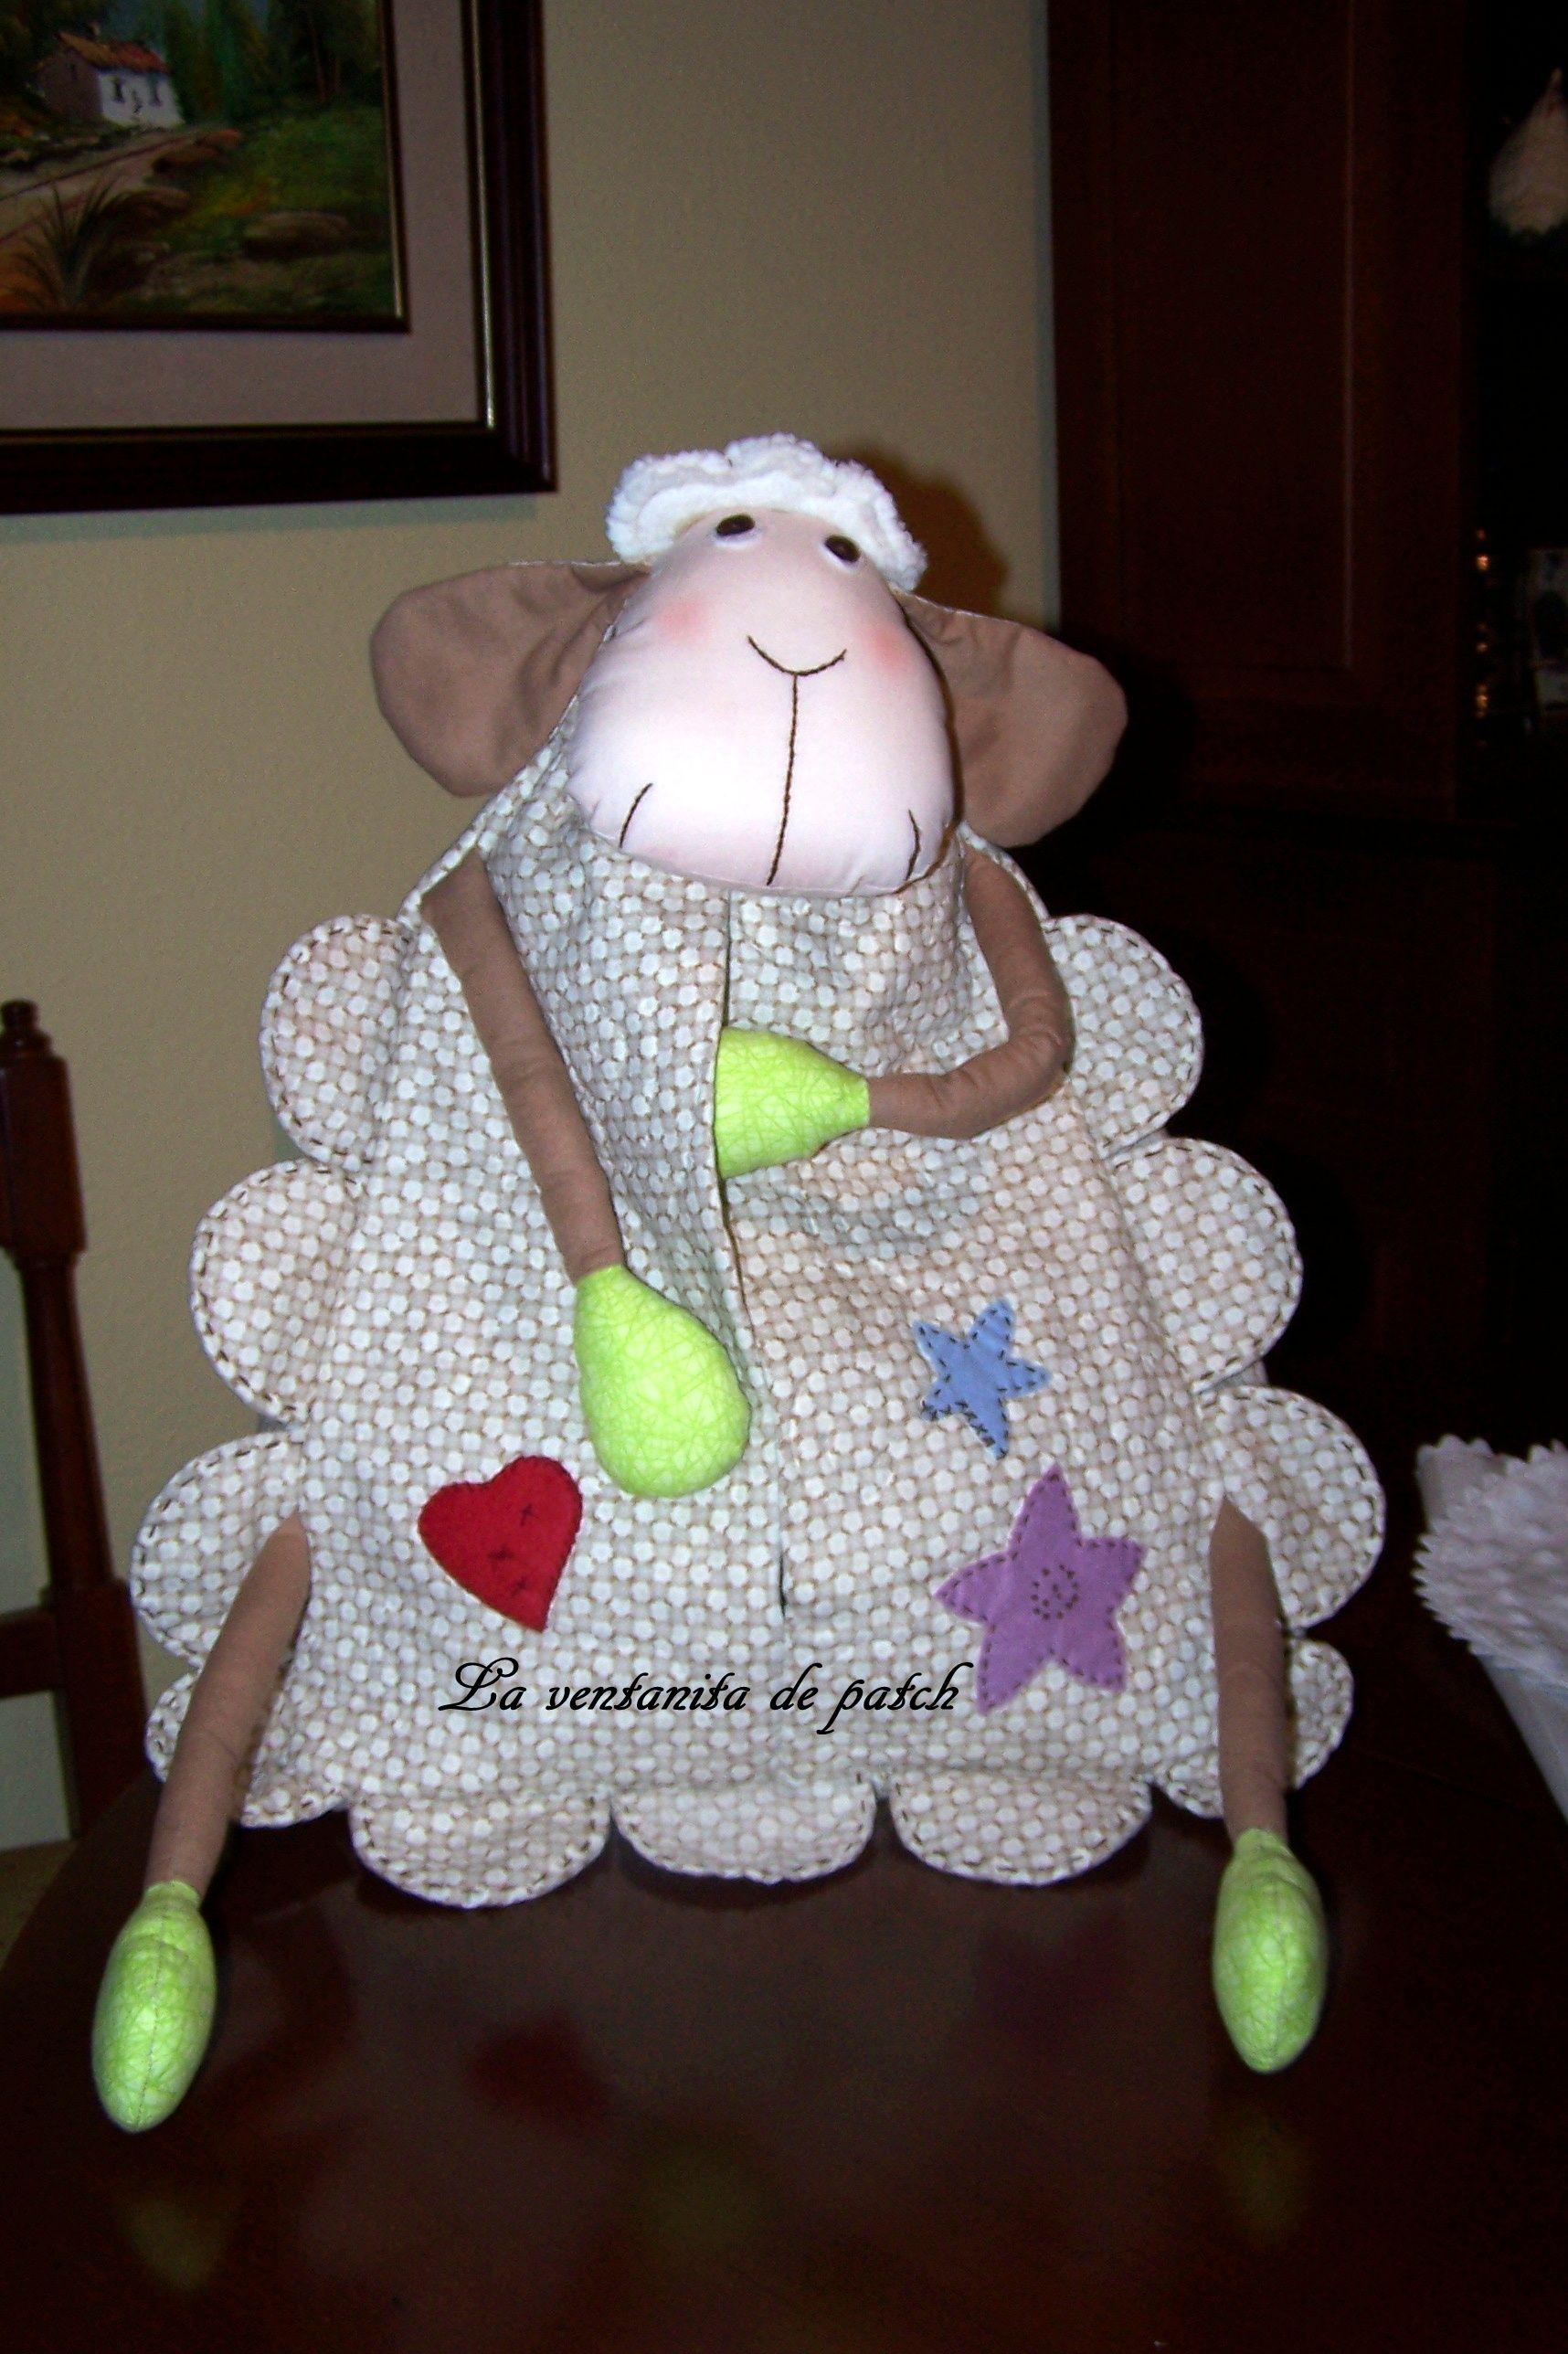 ovejita guarda pañales | manualidades | Pinterest | Oveja ...